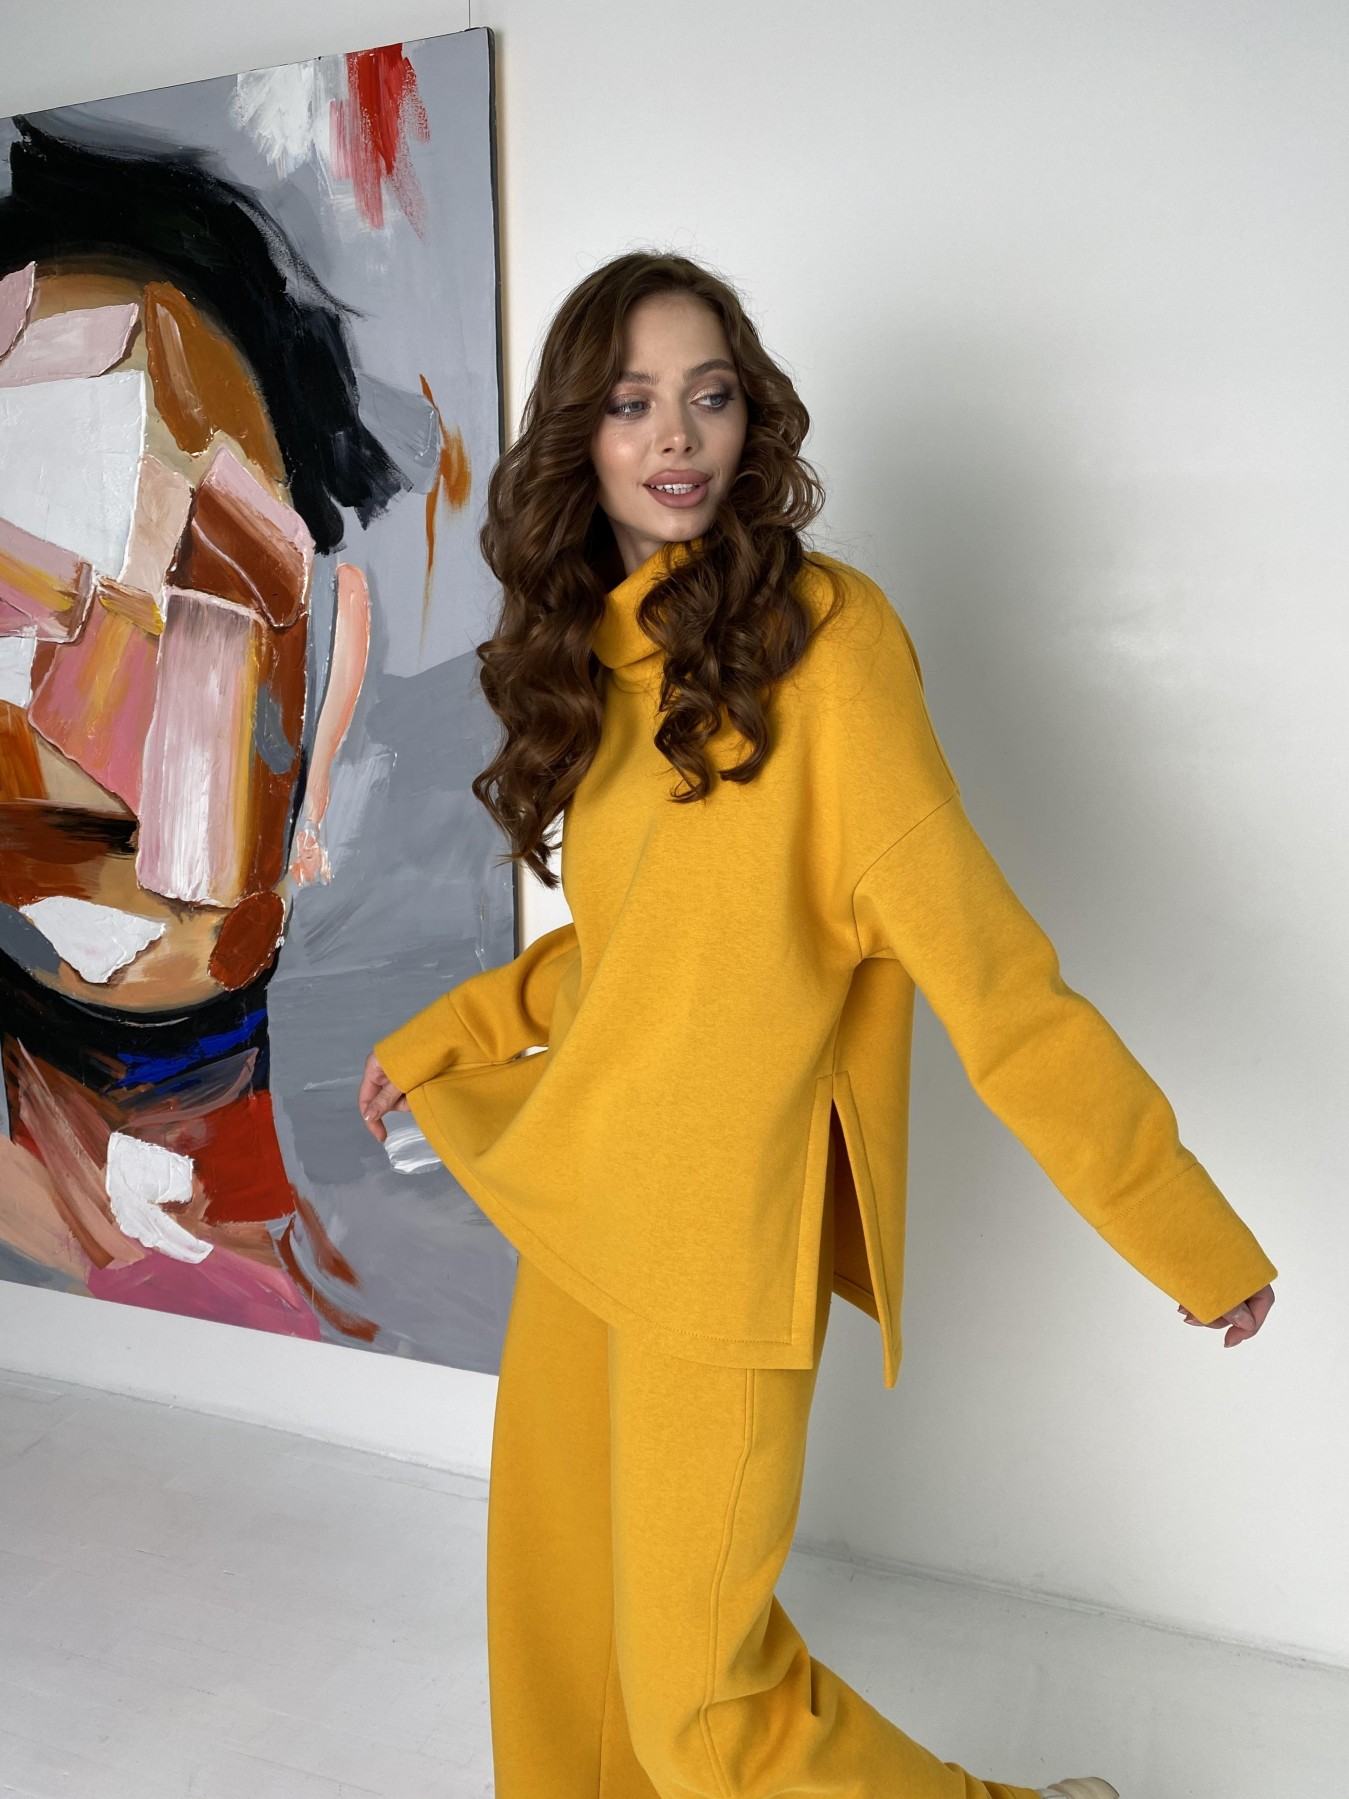 Джаст костюм на флисе 3х нитка 10513 АРТ. 47077 Цвет: Горчица - фото 2, интернет магазин tm-modus.ru